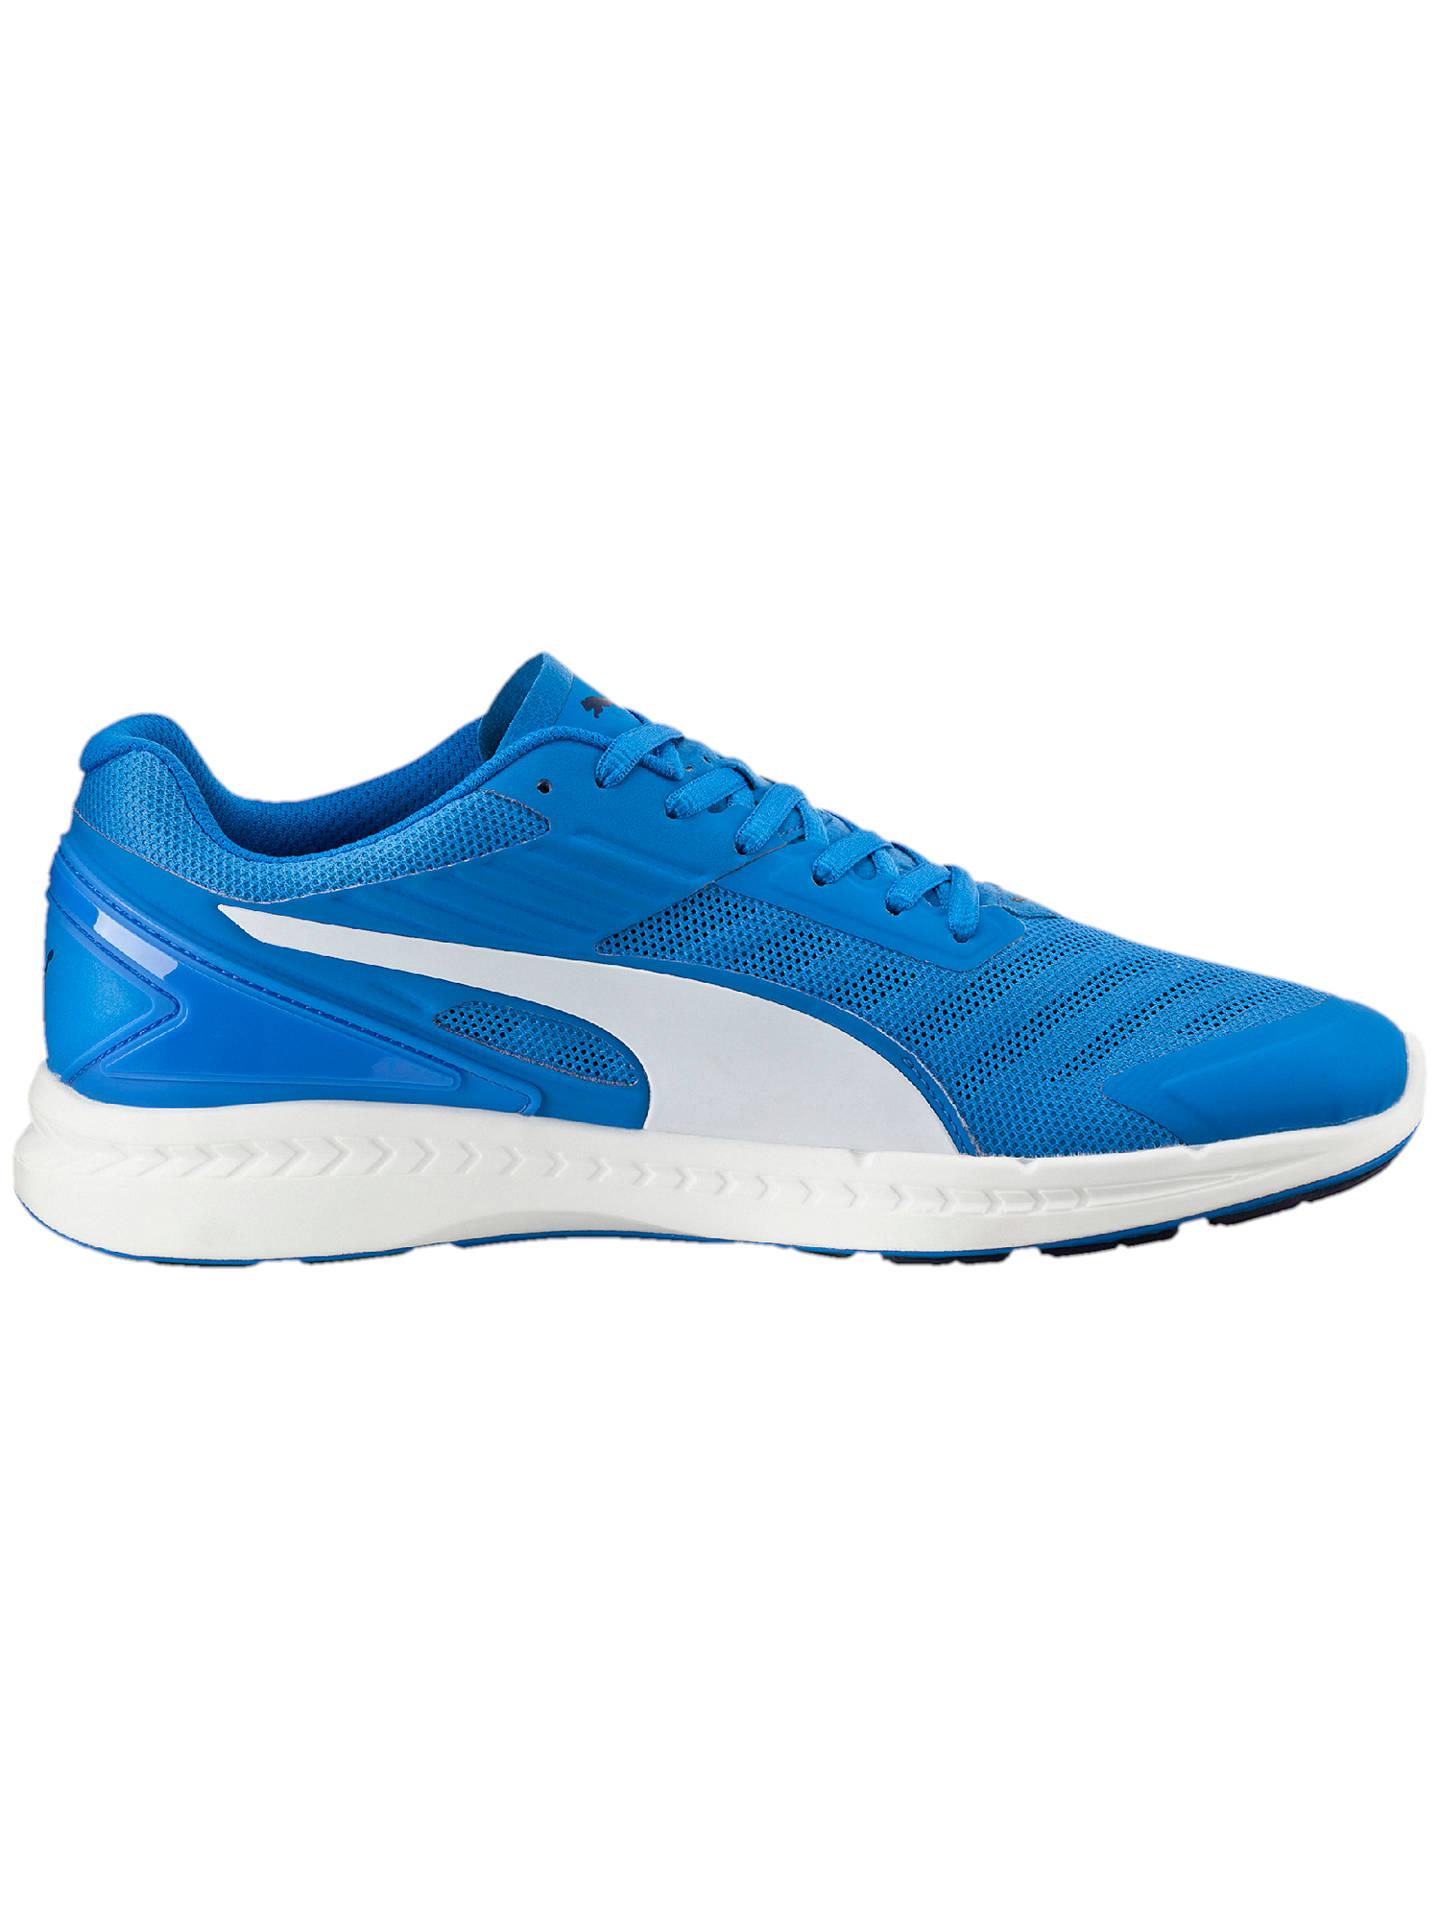 e32dbcd098d1dc BuyPuma Ignite V2 Men s Running Shoes